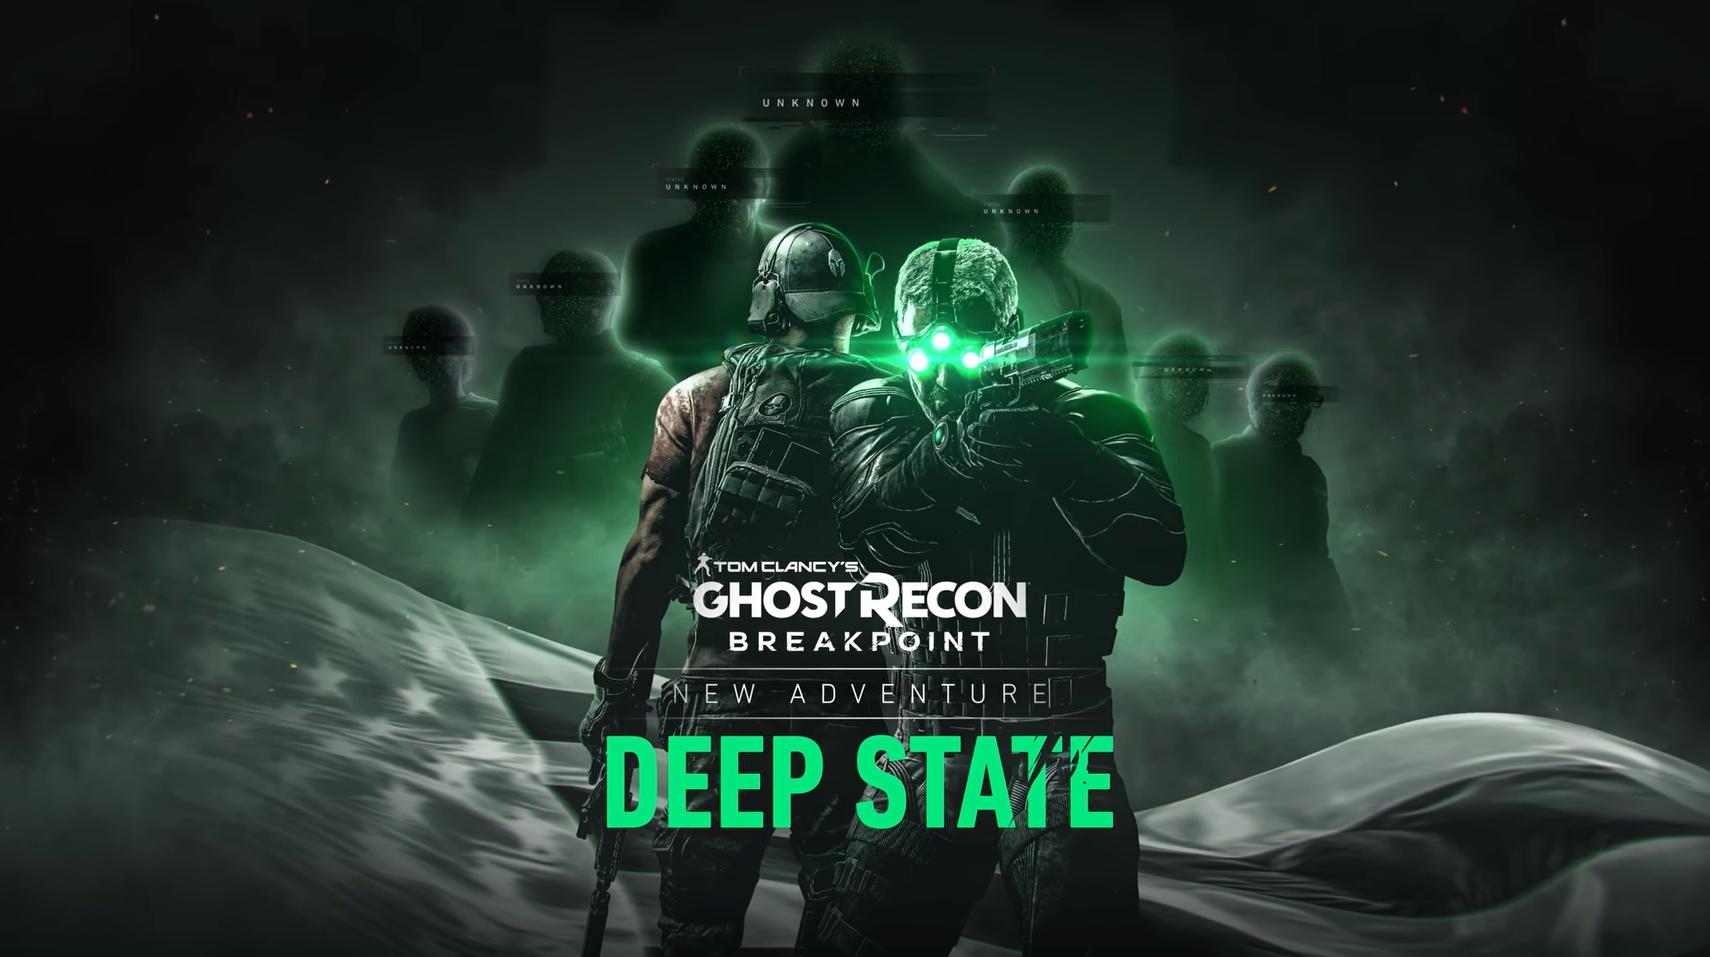 Трейлер обновления Ghost Recon: Breakpoint с участием Сэма Фишера